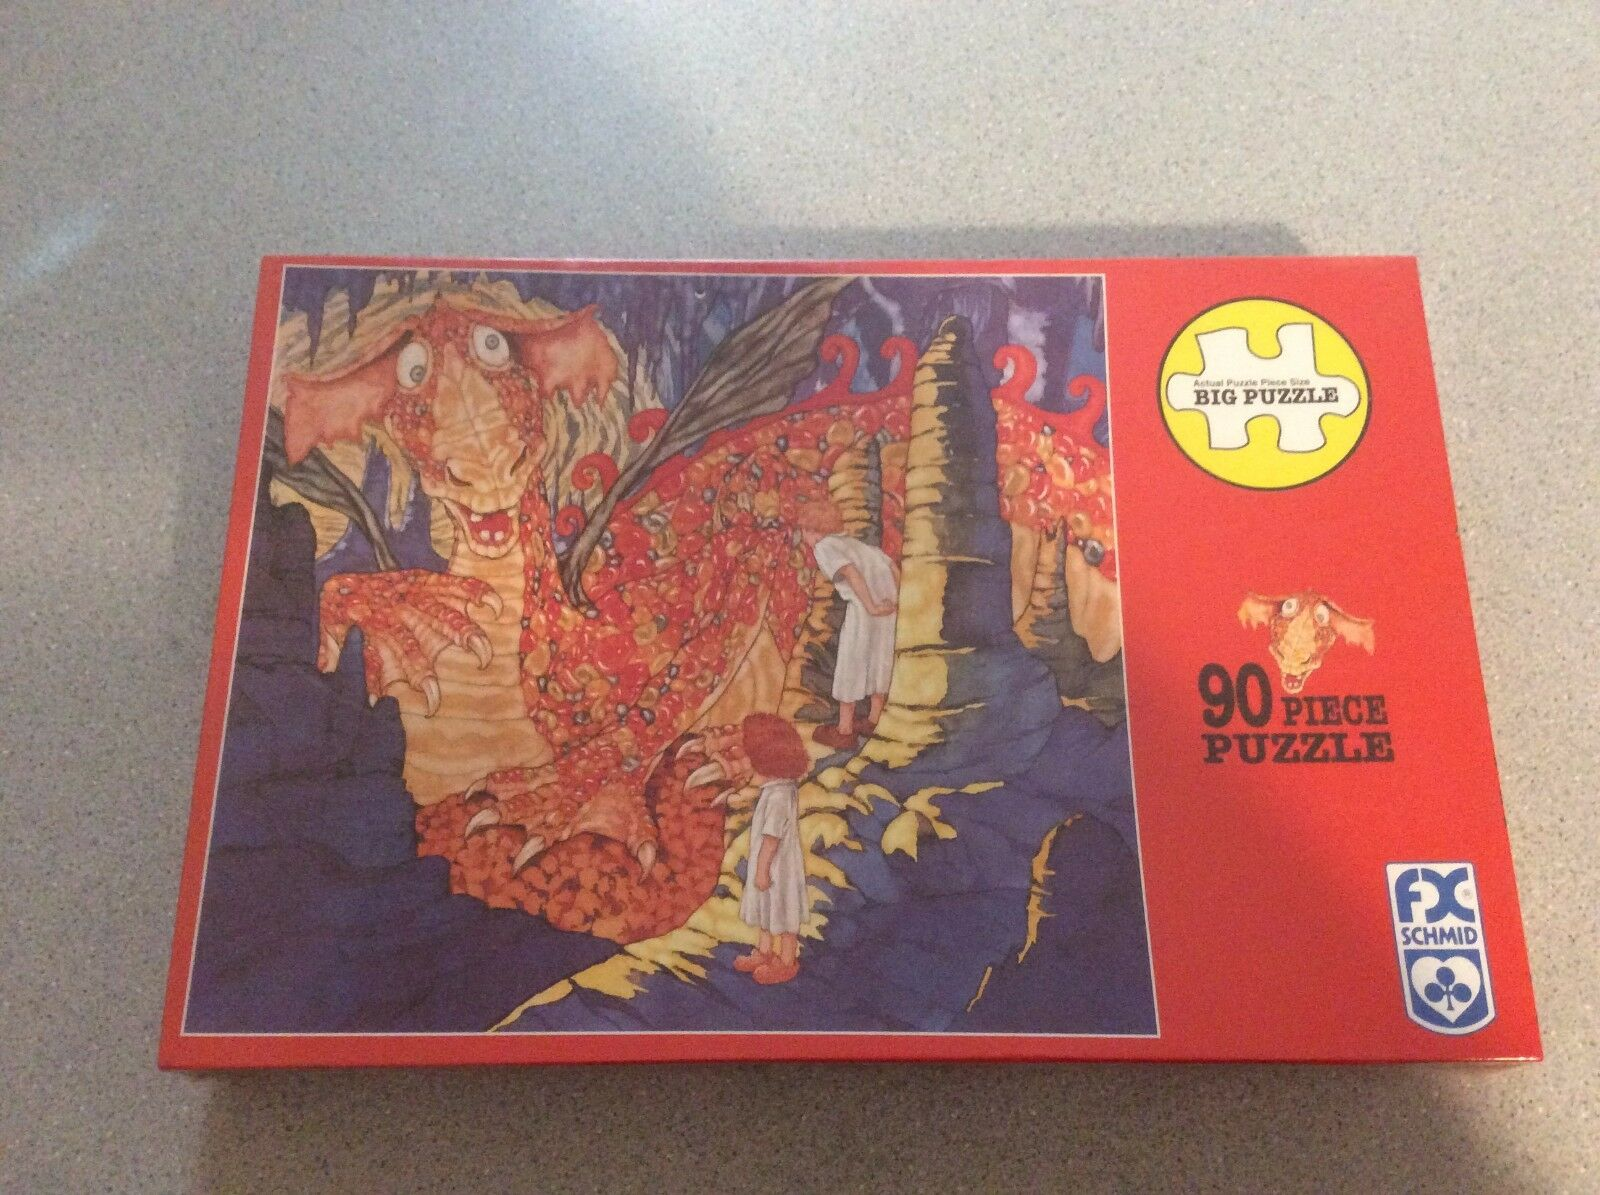 90 Piece Big Puzzle Jelly Bean Bean Bean Dragon Schmid No. 90111 New Sealed 49b1f0